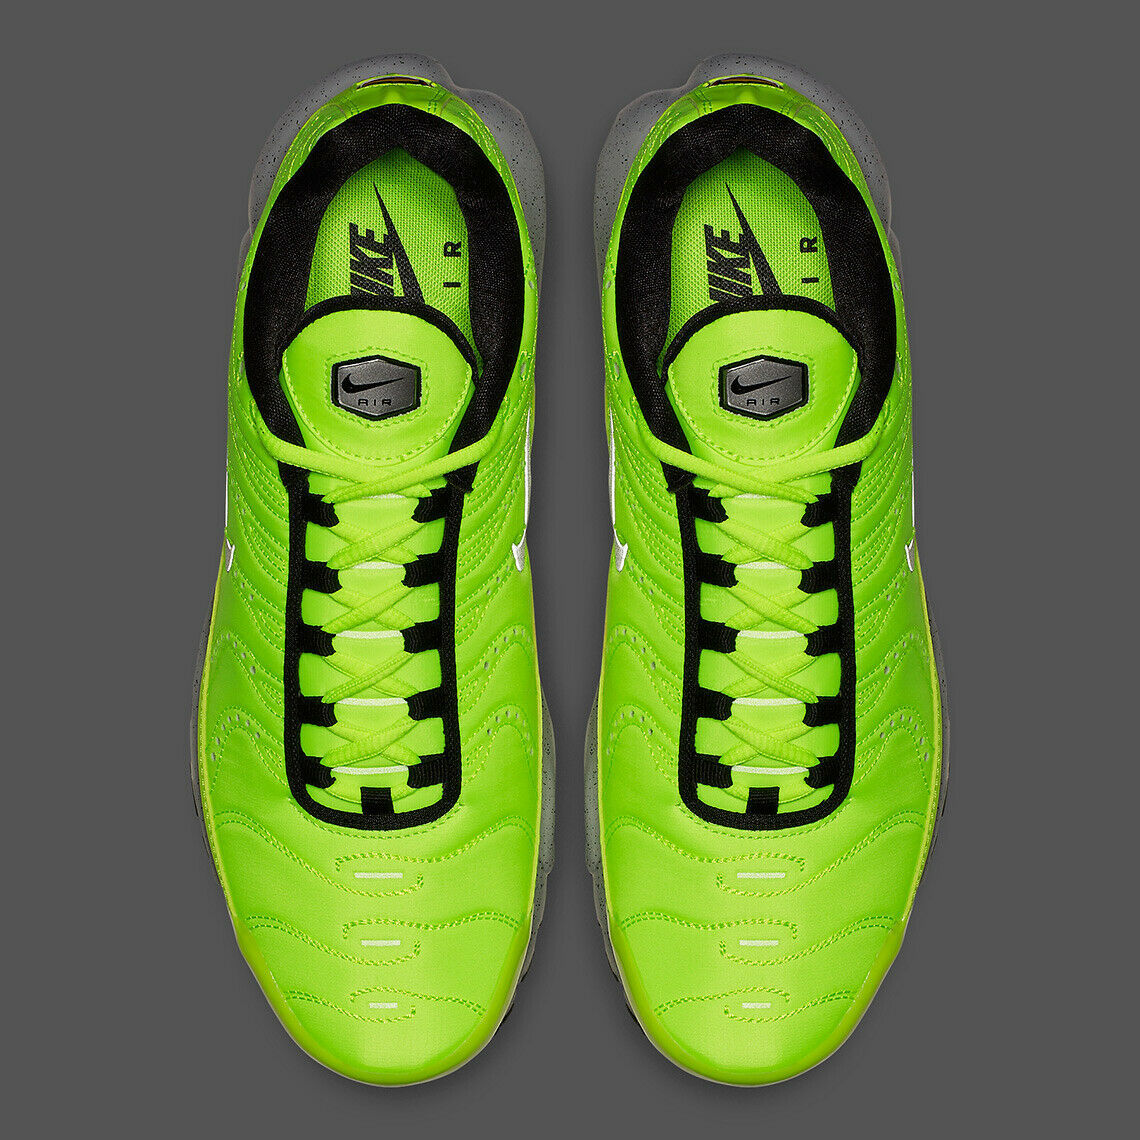 Nike Air Max Plus Premium Volt/Matte Silver-Wolf Grey-Black Shoes